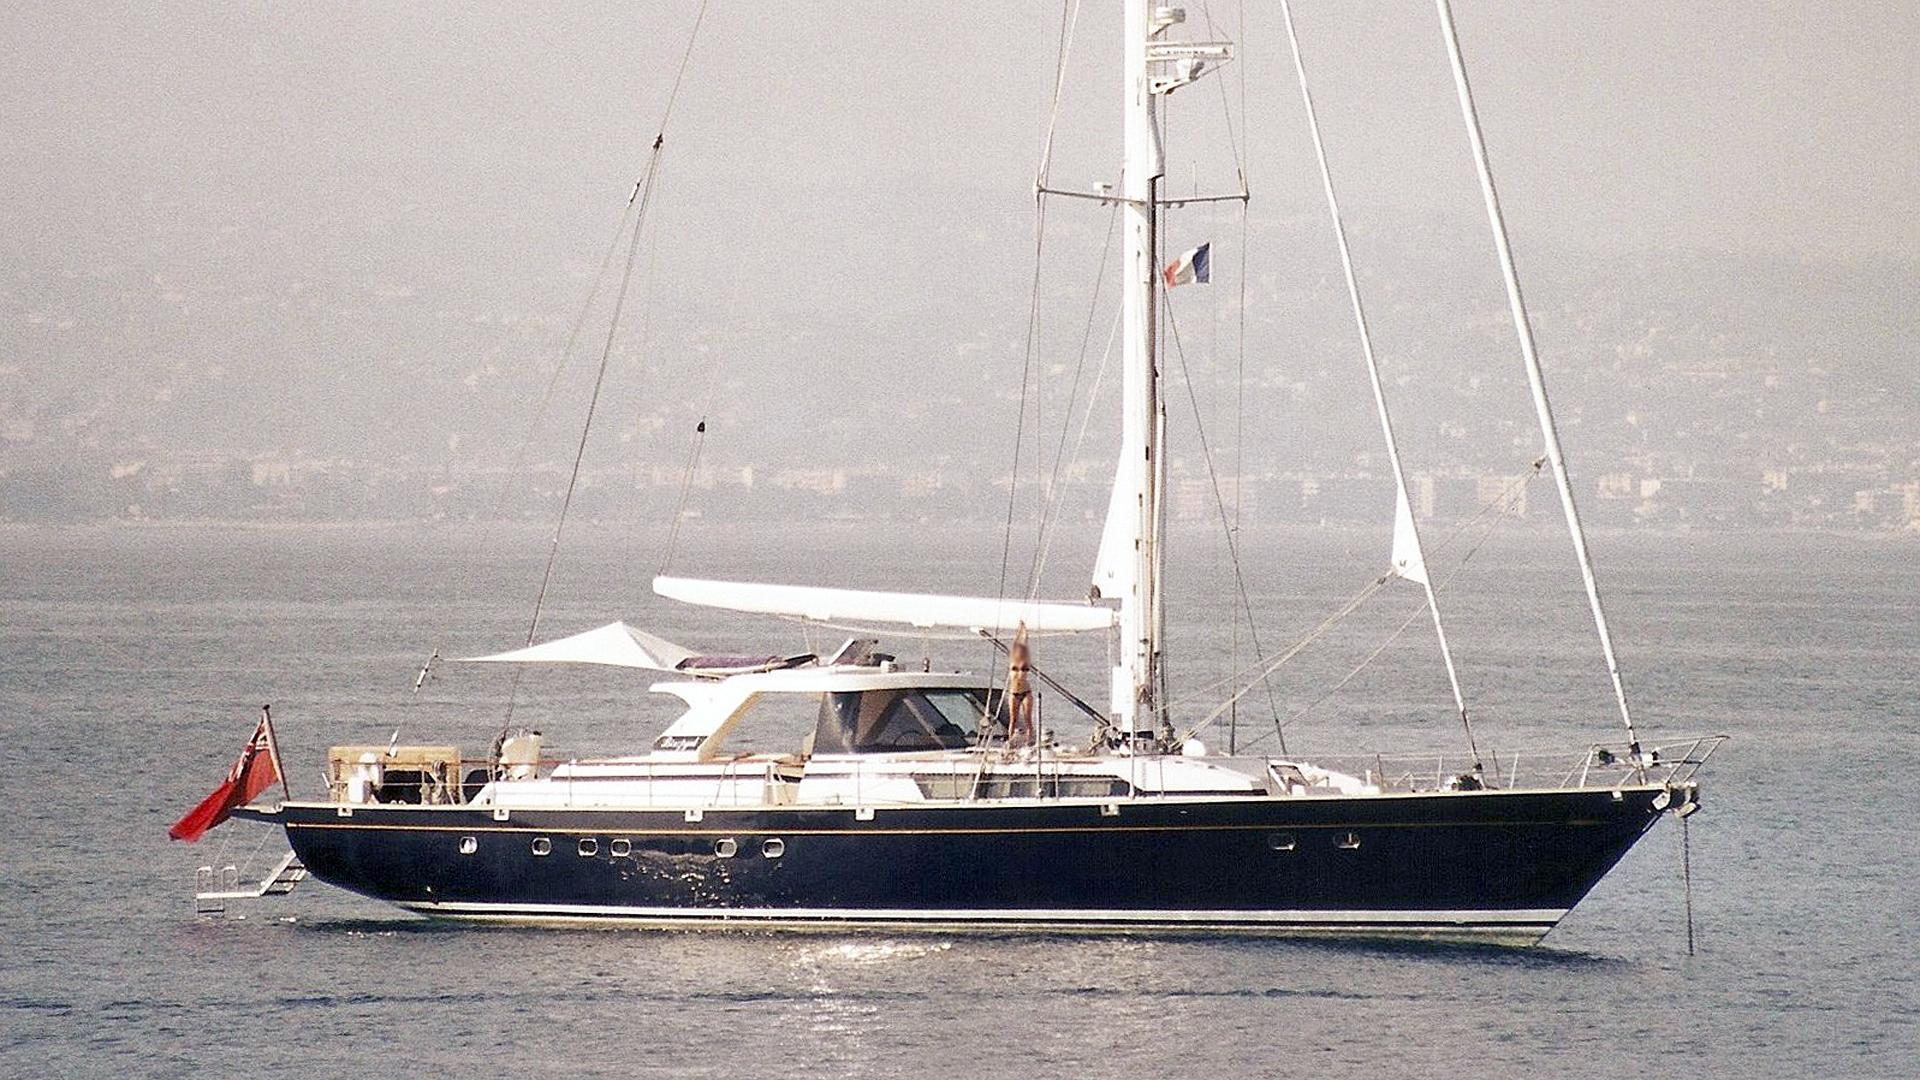 binziyad-sailing-yacht-cim-maxi-88-1996-30m-profile